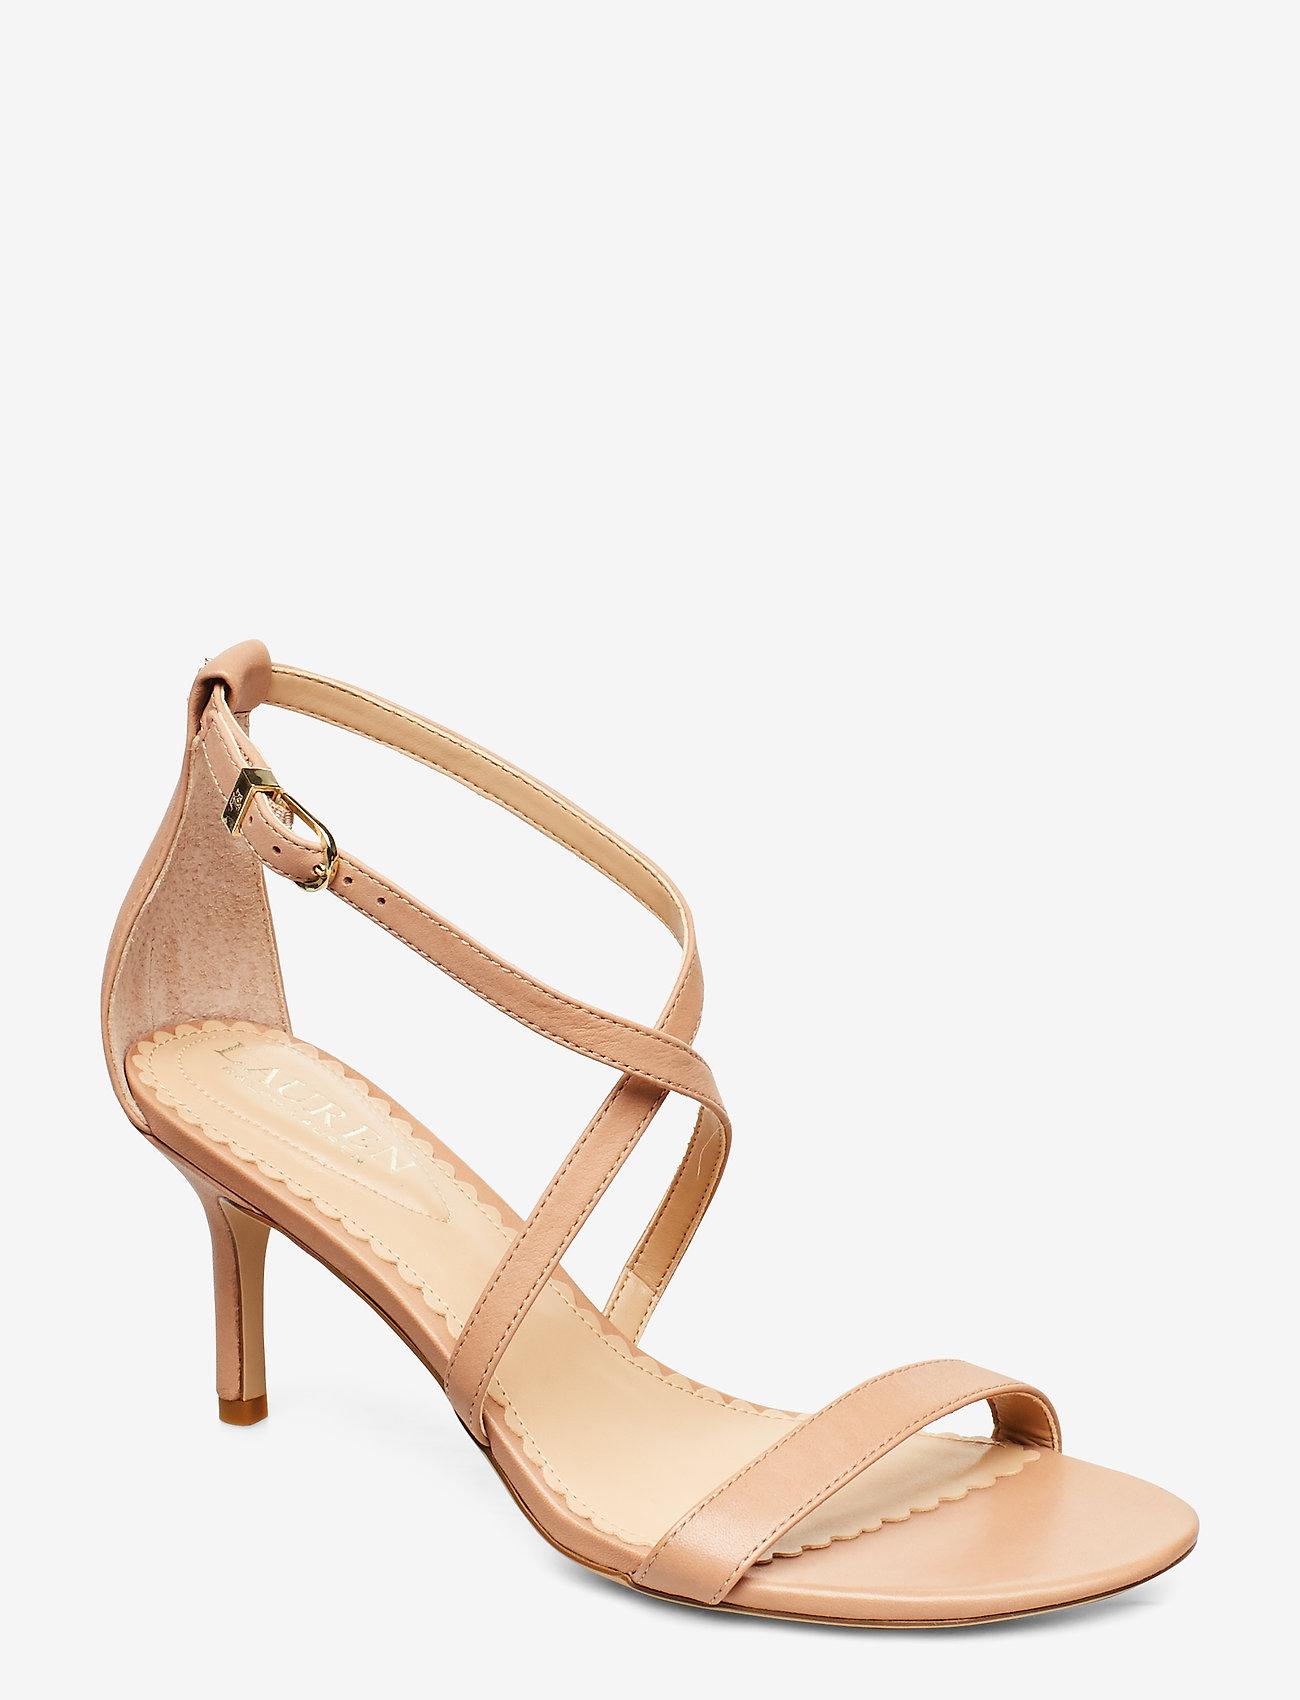 Leaton Leather Sandal (Nude) (54.98